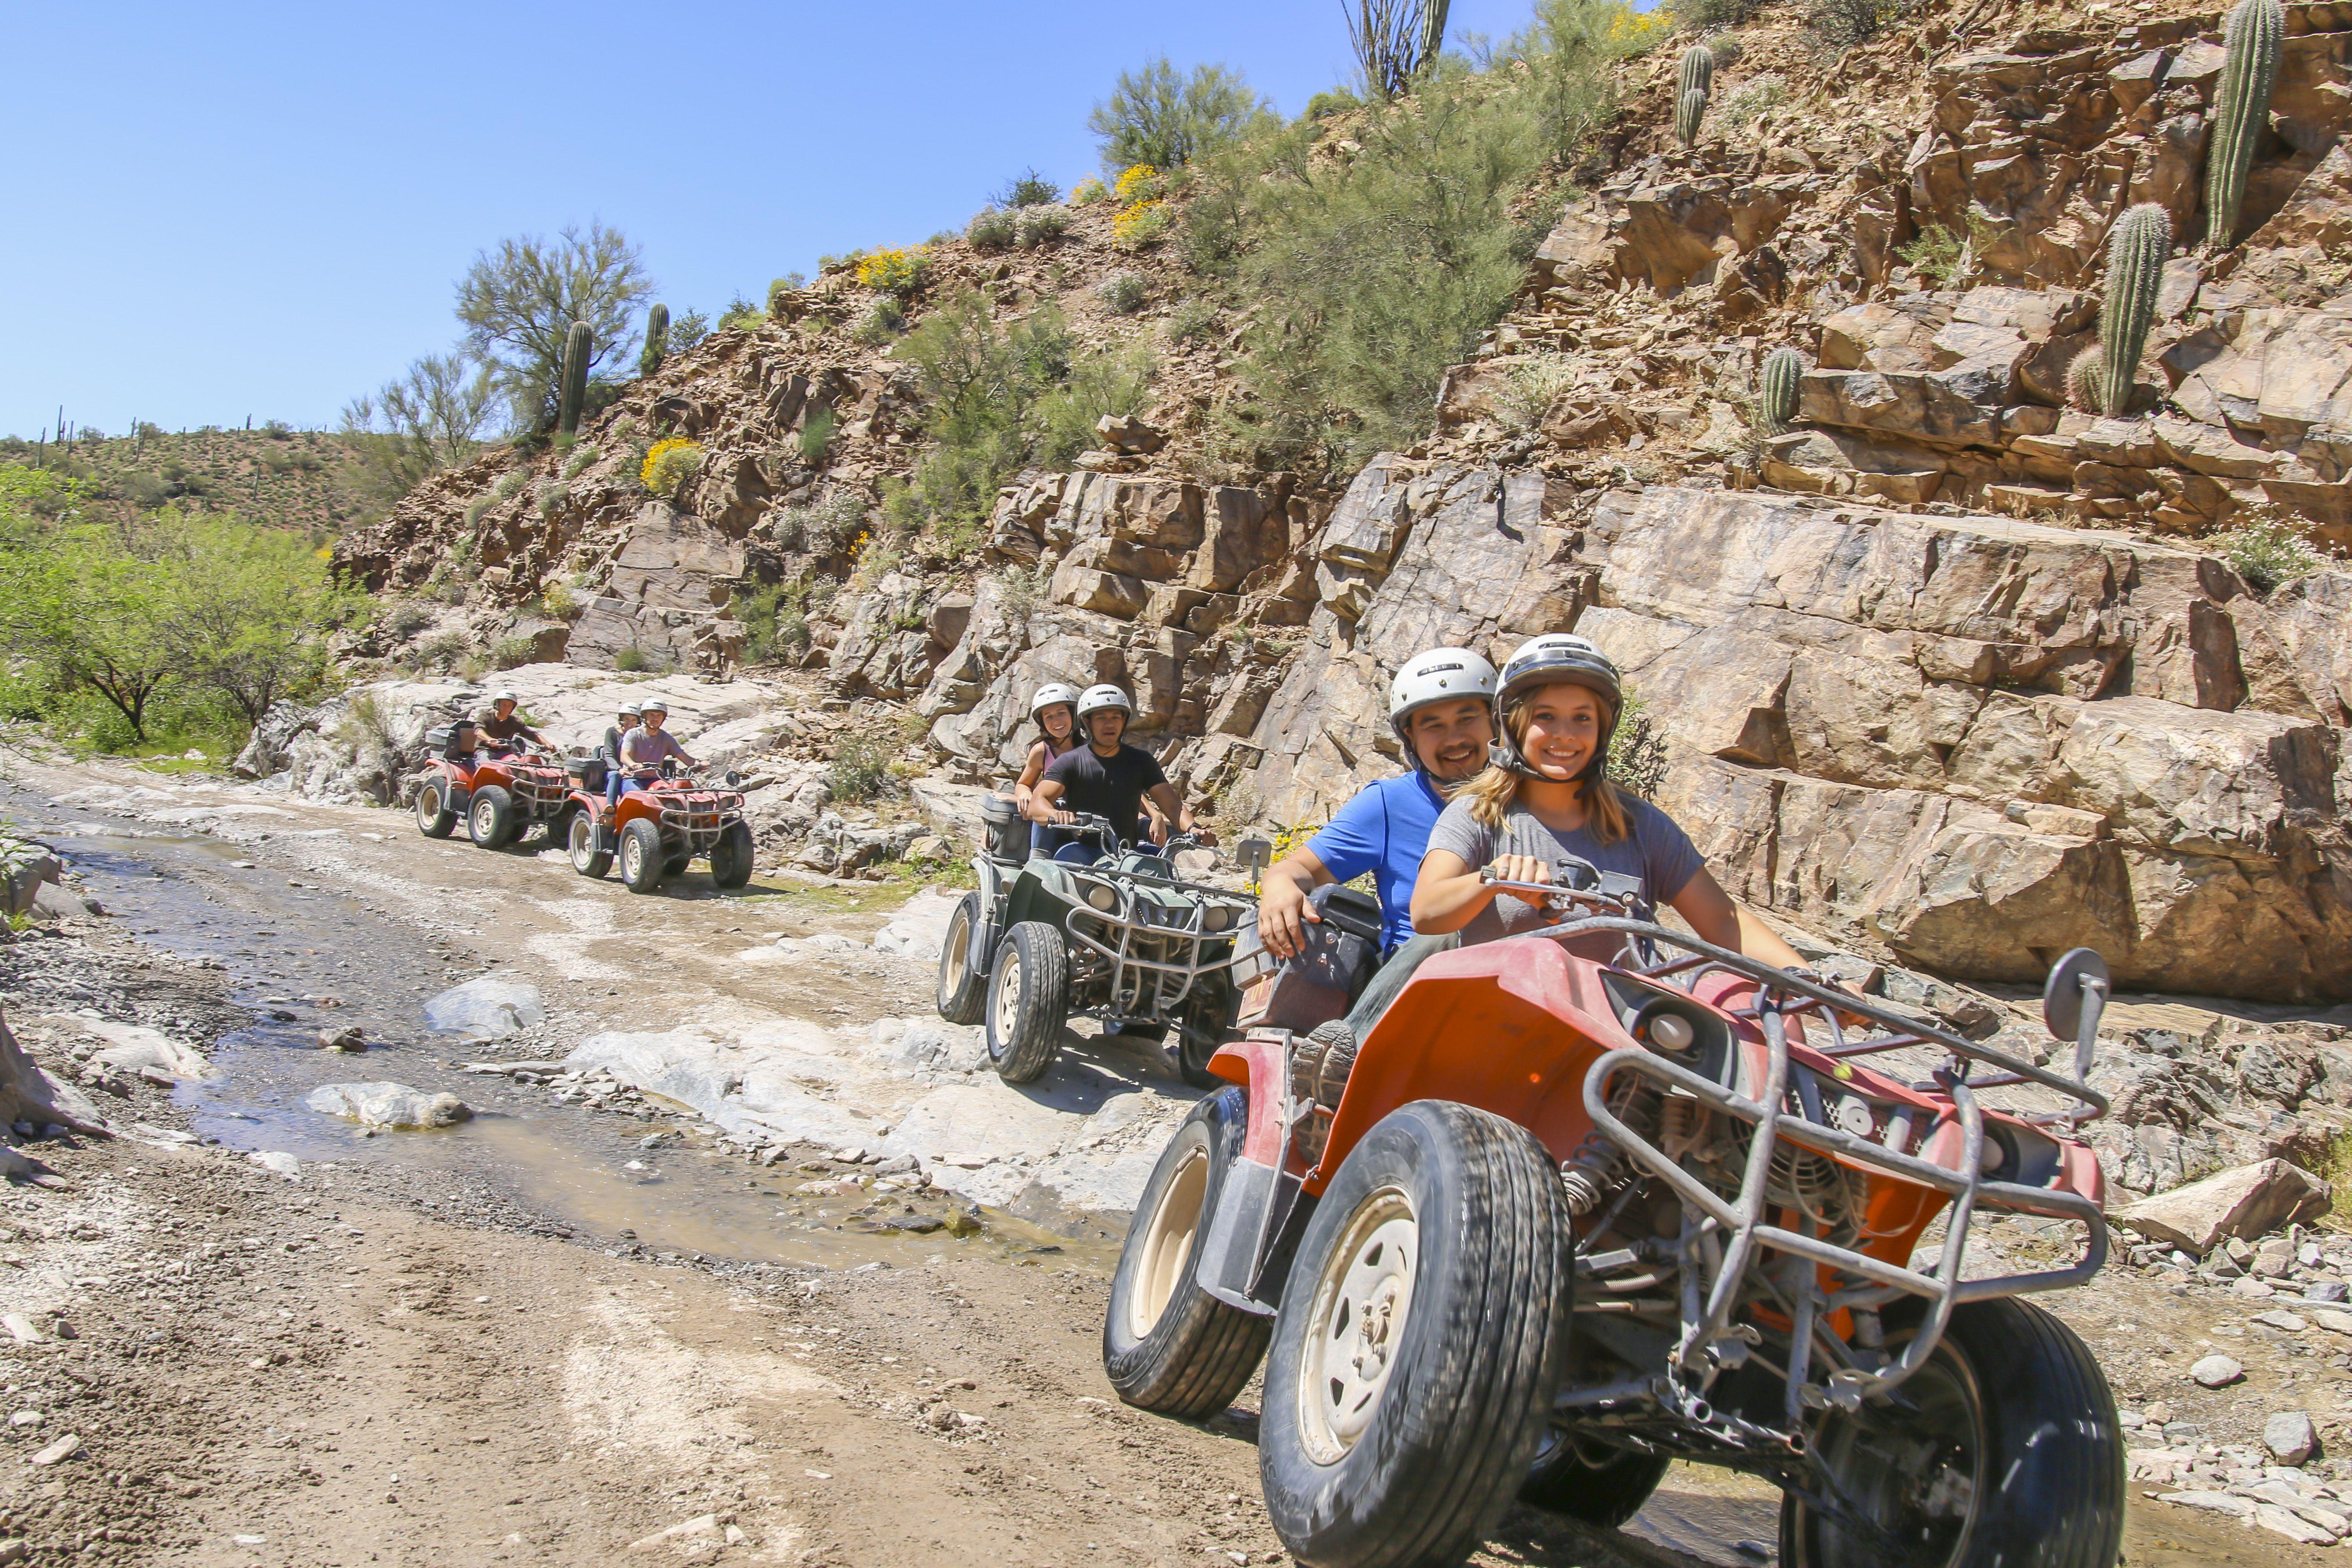 Exploring arizona is always amazing but you should see